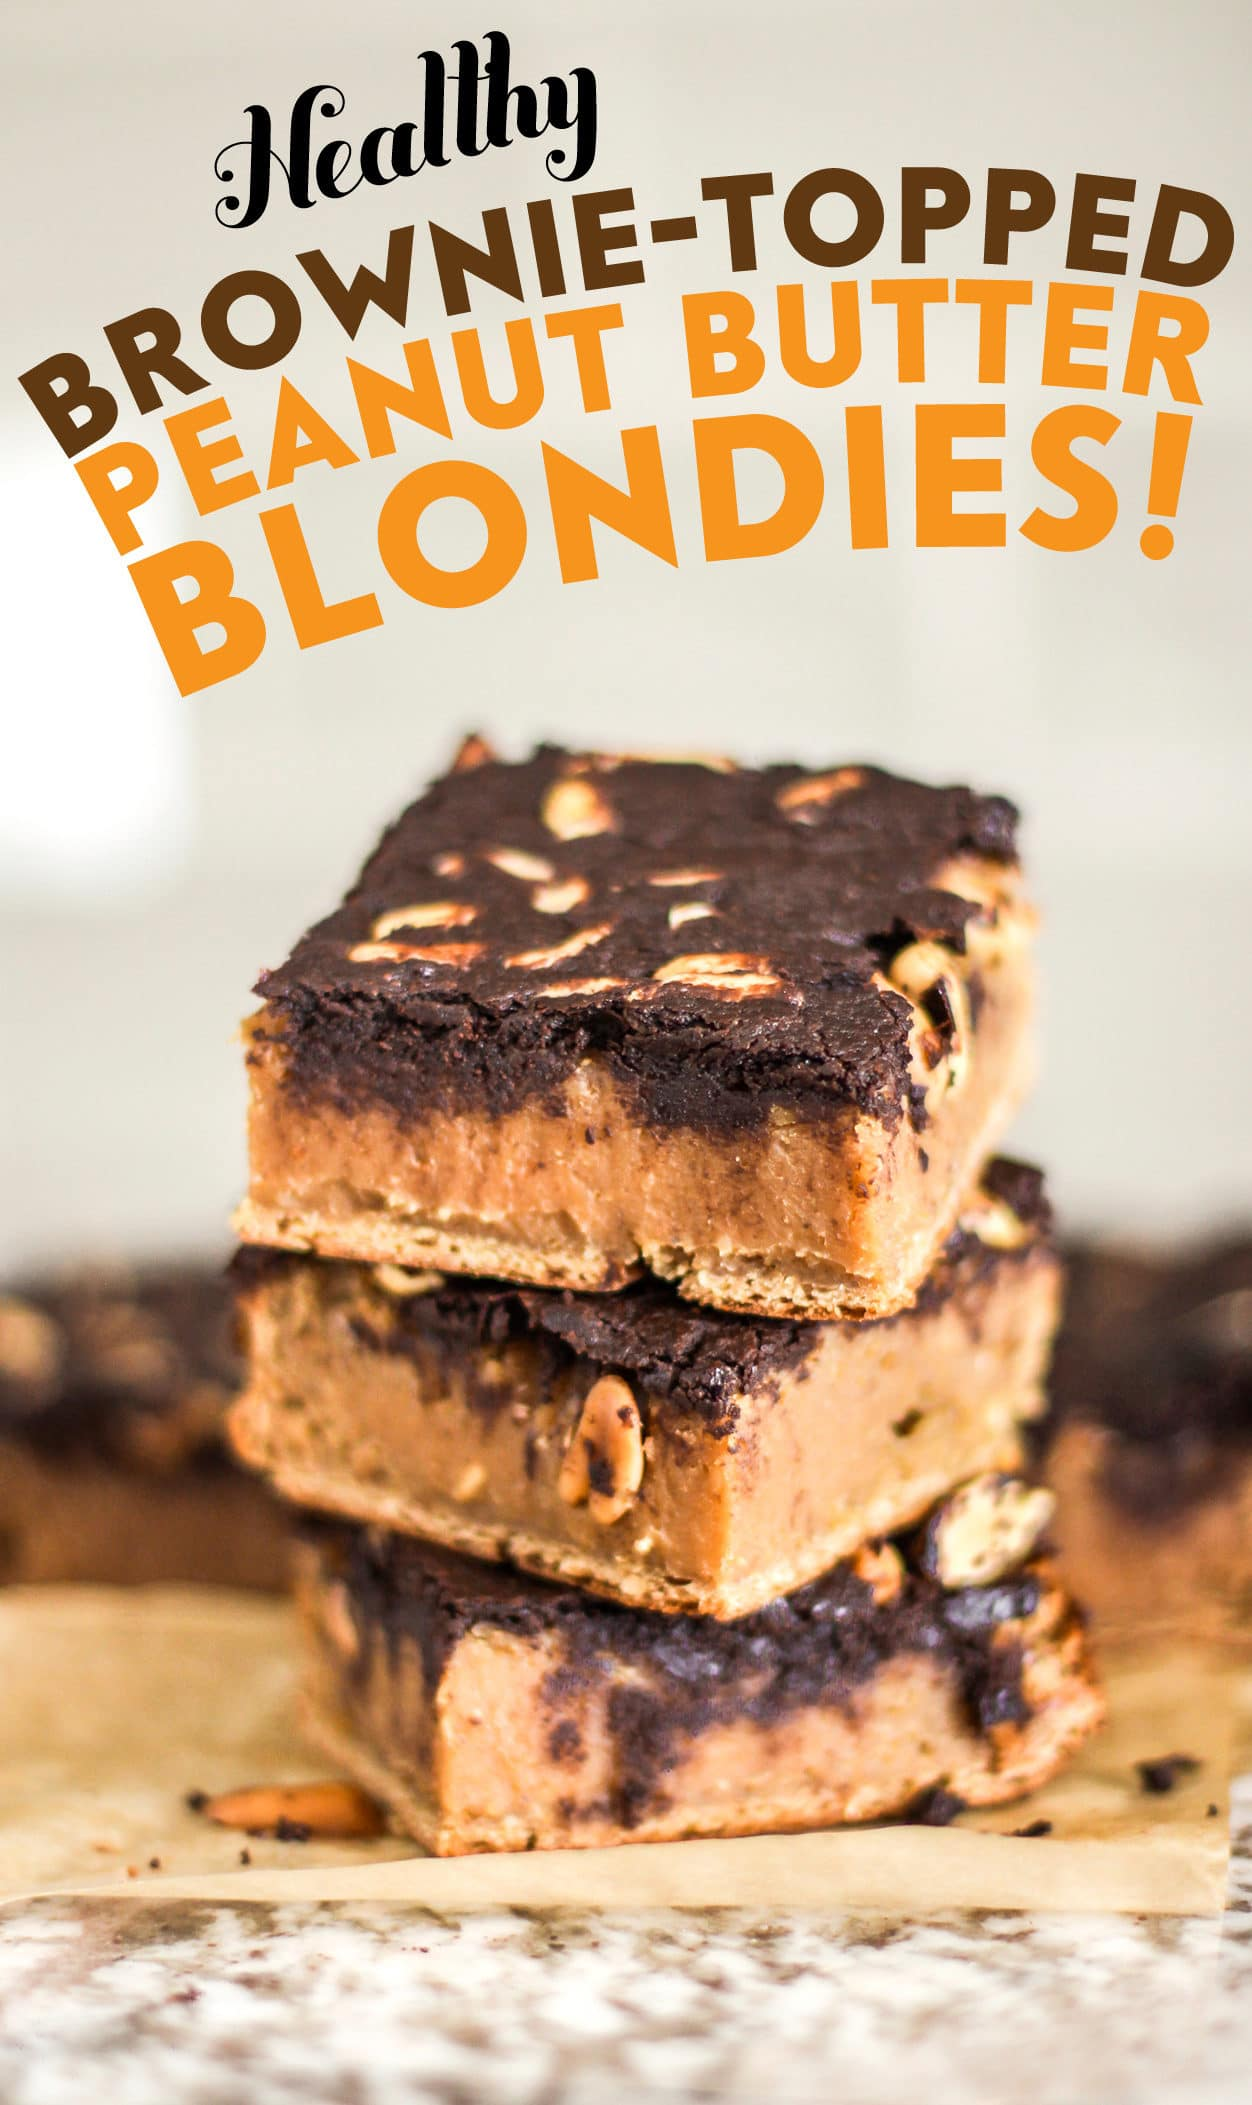 Healthy Brownie-Topped Peanut Butter Blondies (refined sugar free, high protein, high fiber, gluten free, vegan) - Healthy Dessert Recipes at Desserts with Benefits